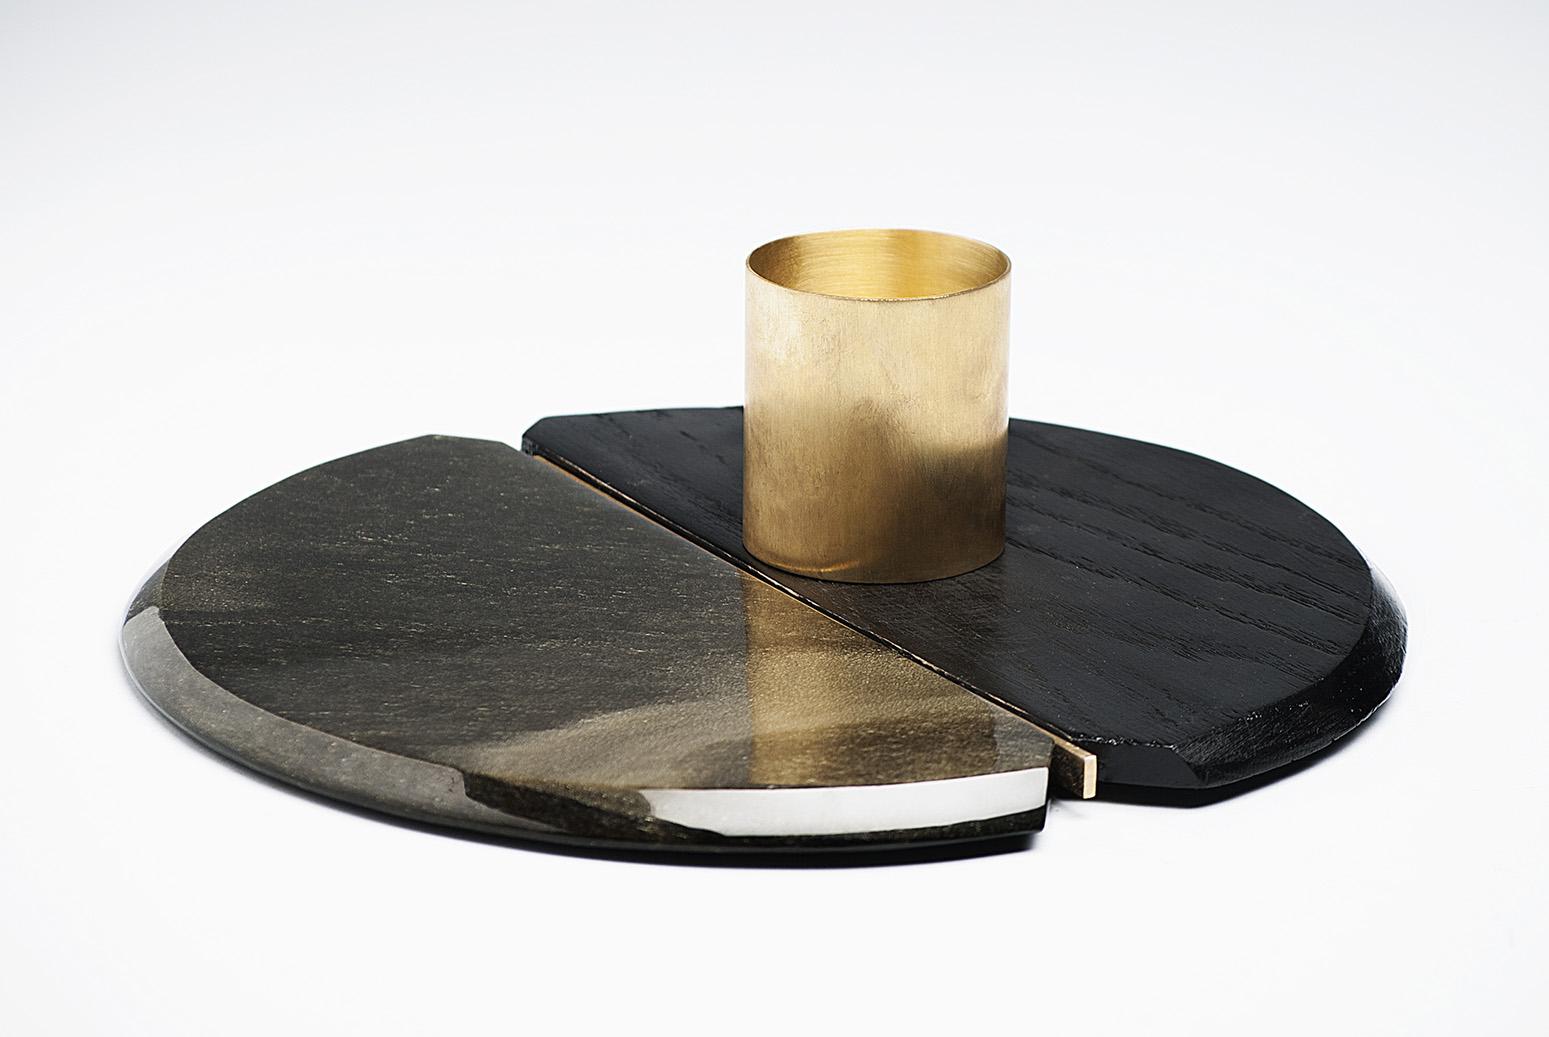 Obsidian-wood-brass-tray-designer-Ana Karen Chaires-artisan-Pablo Cruz Gómez-Anahuac-MarionFriedmann-MexicoDesignTime12.jpg